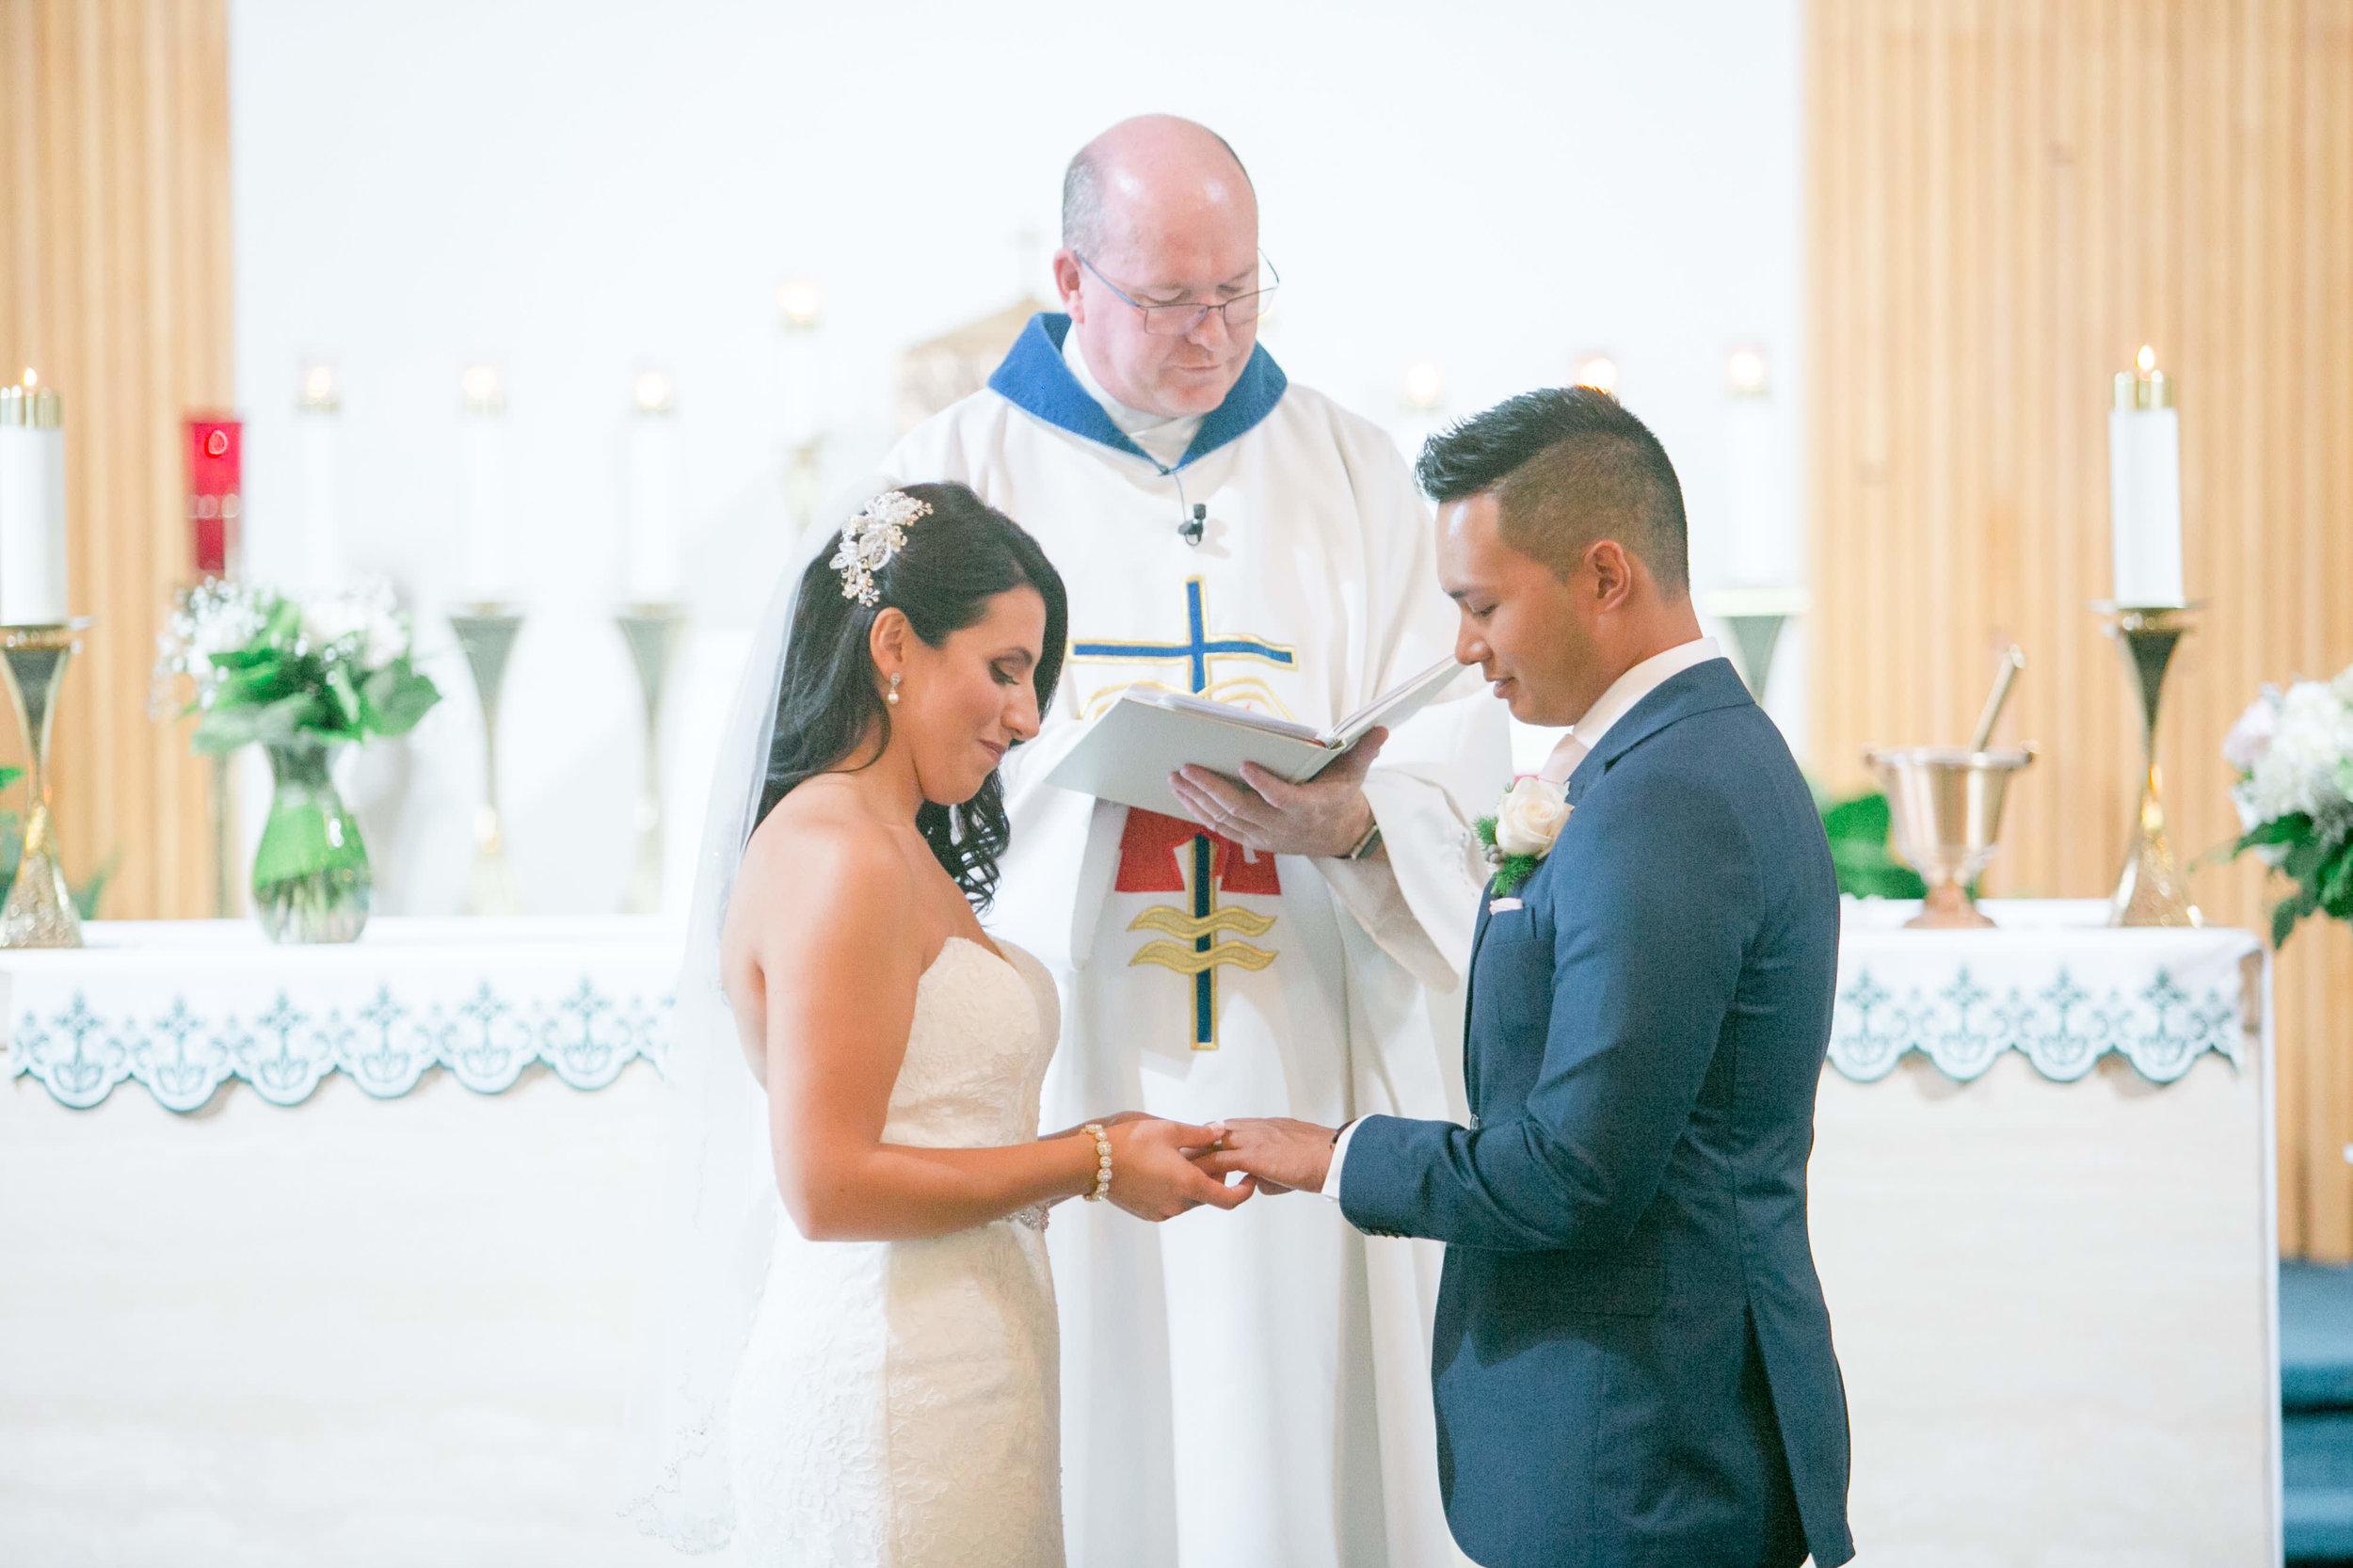 Stefanie___Bernard___Daniel_Ricci_Weddings_High_Res._Finals__254.jpg